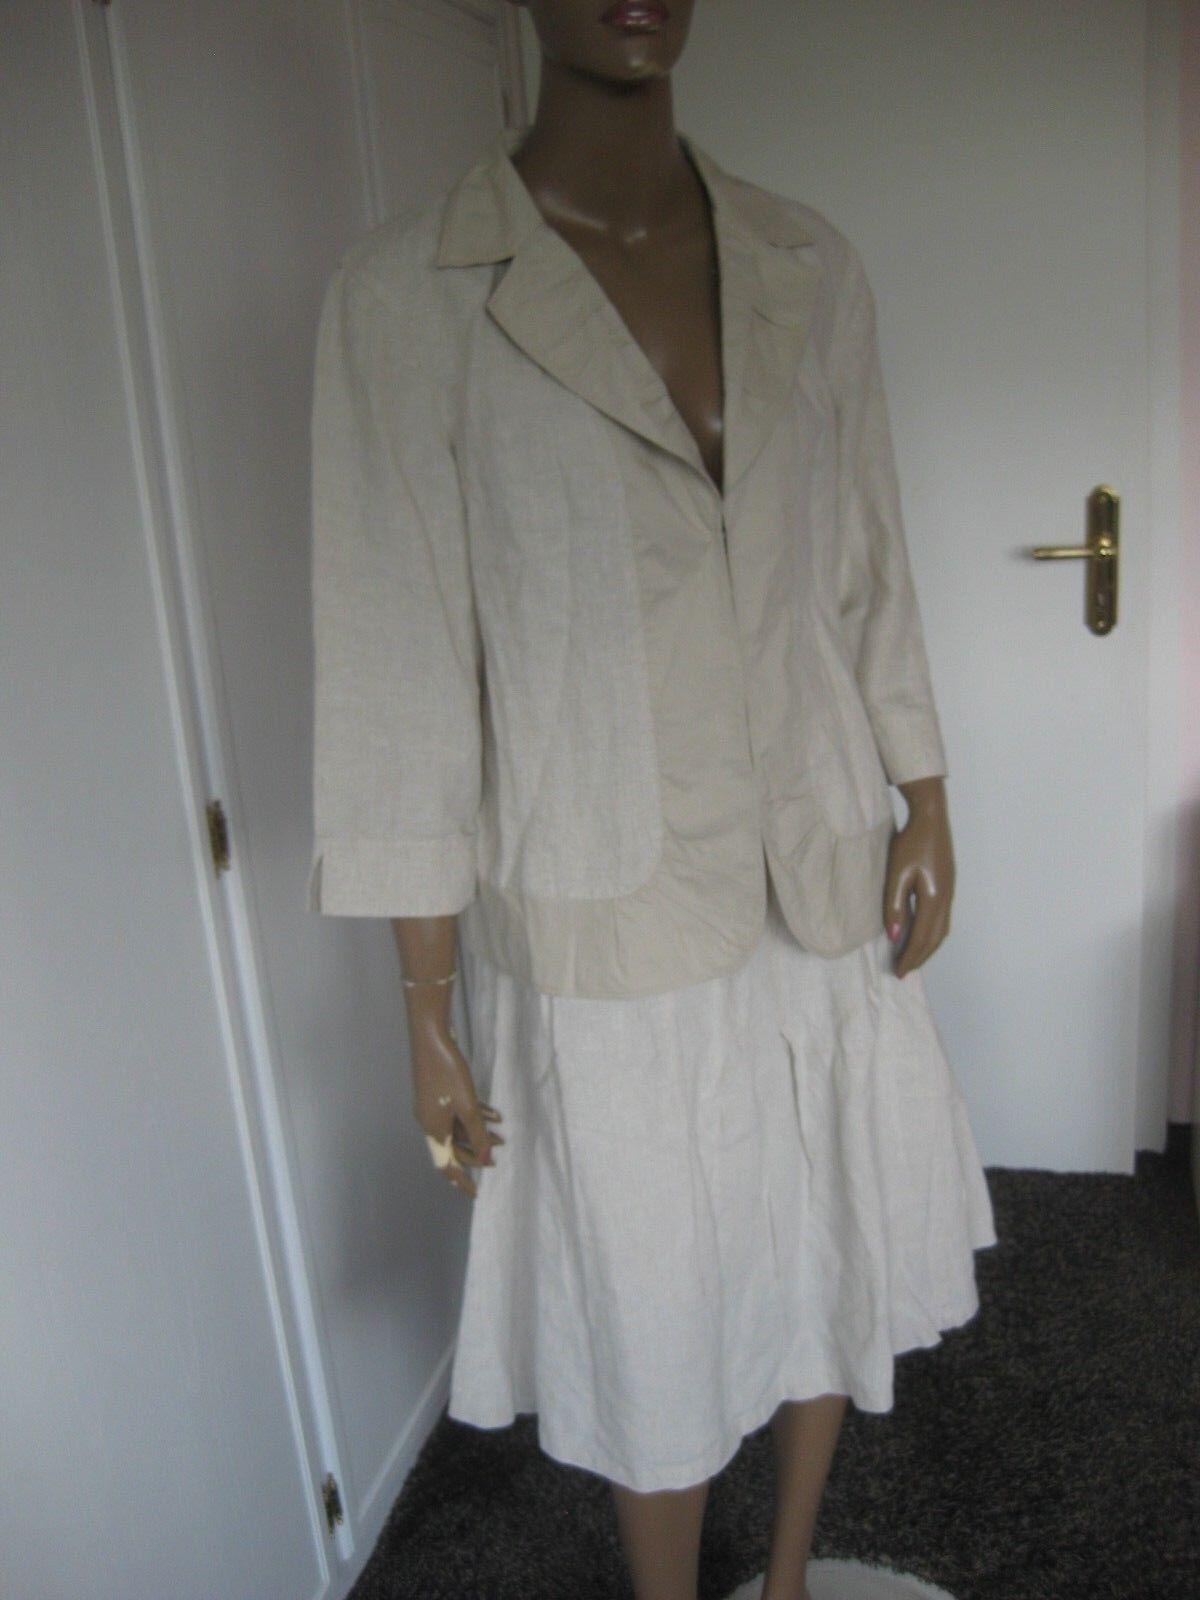 bbad420a36 Barclay Costume Rock + Blazer beigeton tg. 46 100% LINO Betty Heller  nrfvcy4695-Tailleur e abiti sartoriali